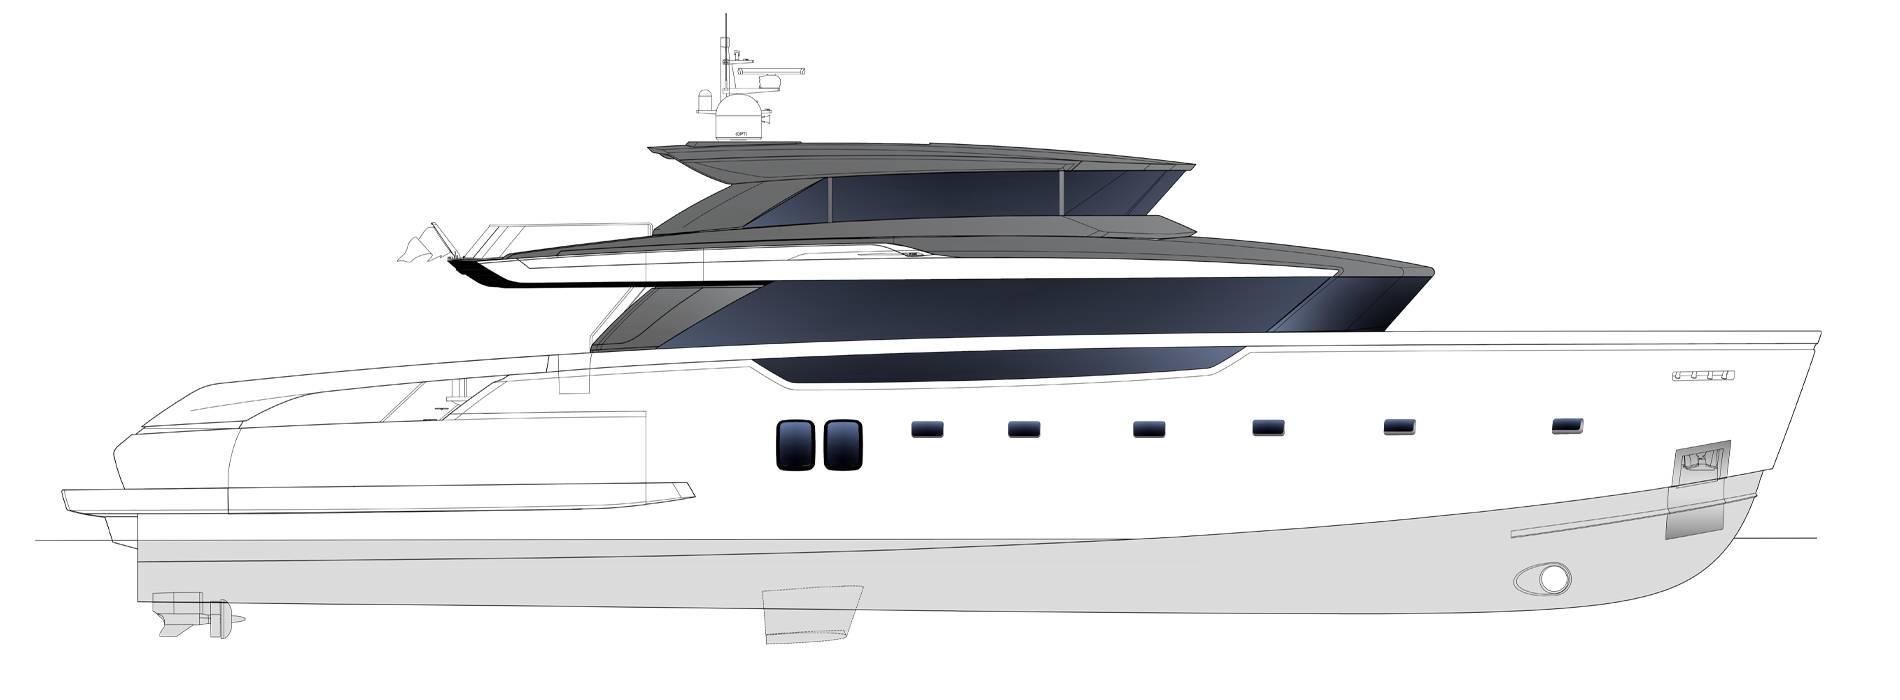 Sanlorenzo Yachts SX112 外观